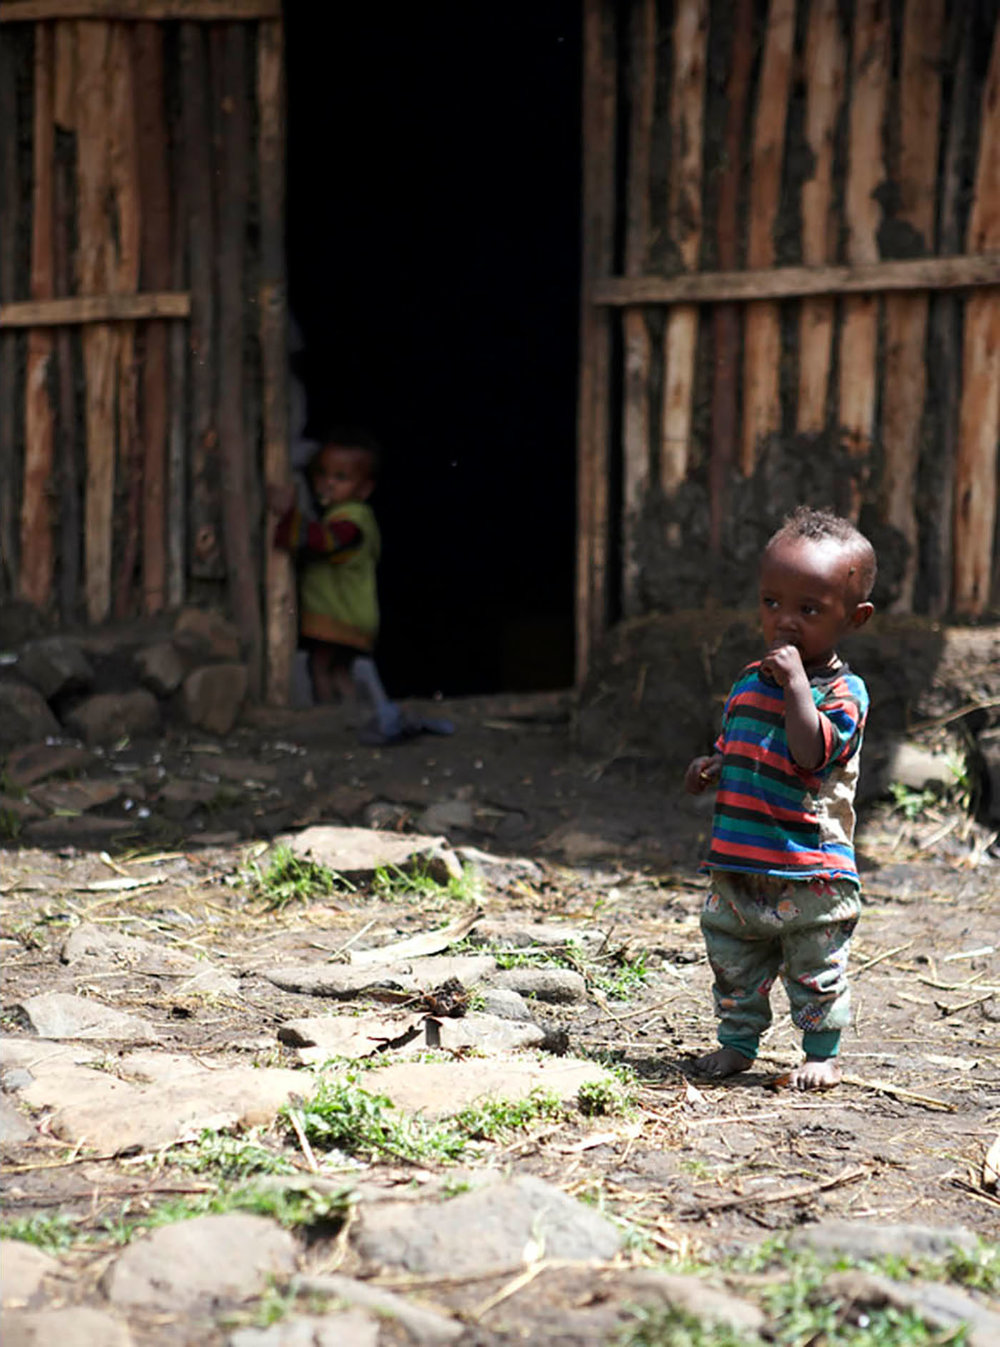 Angus McDonald Photography - Save the Children